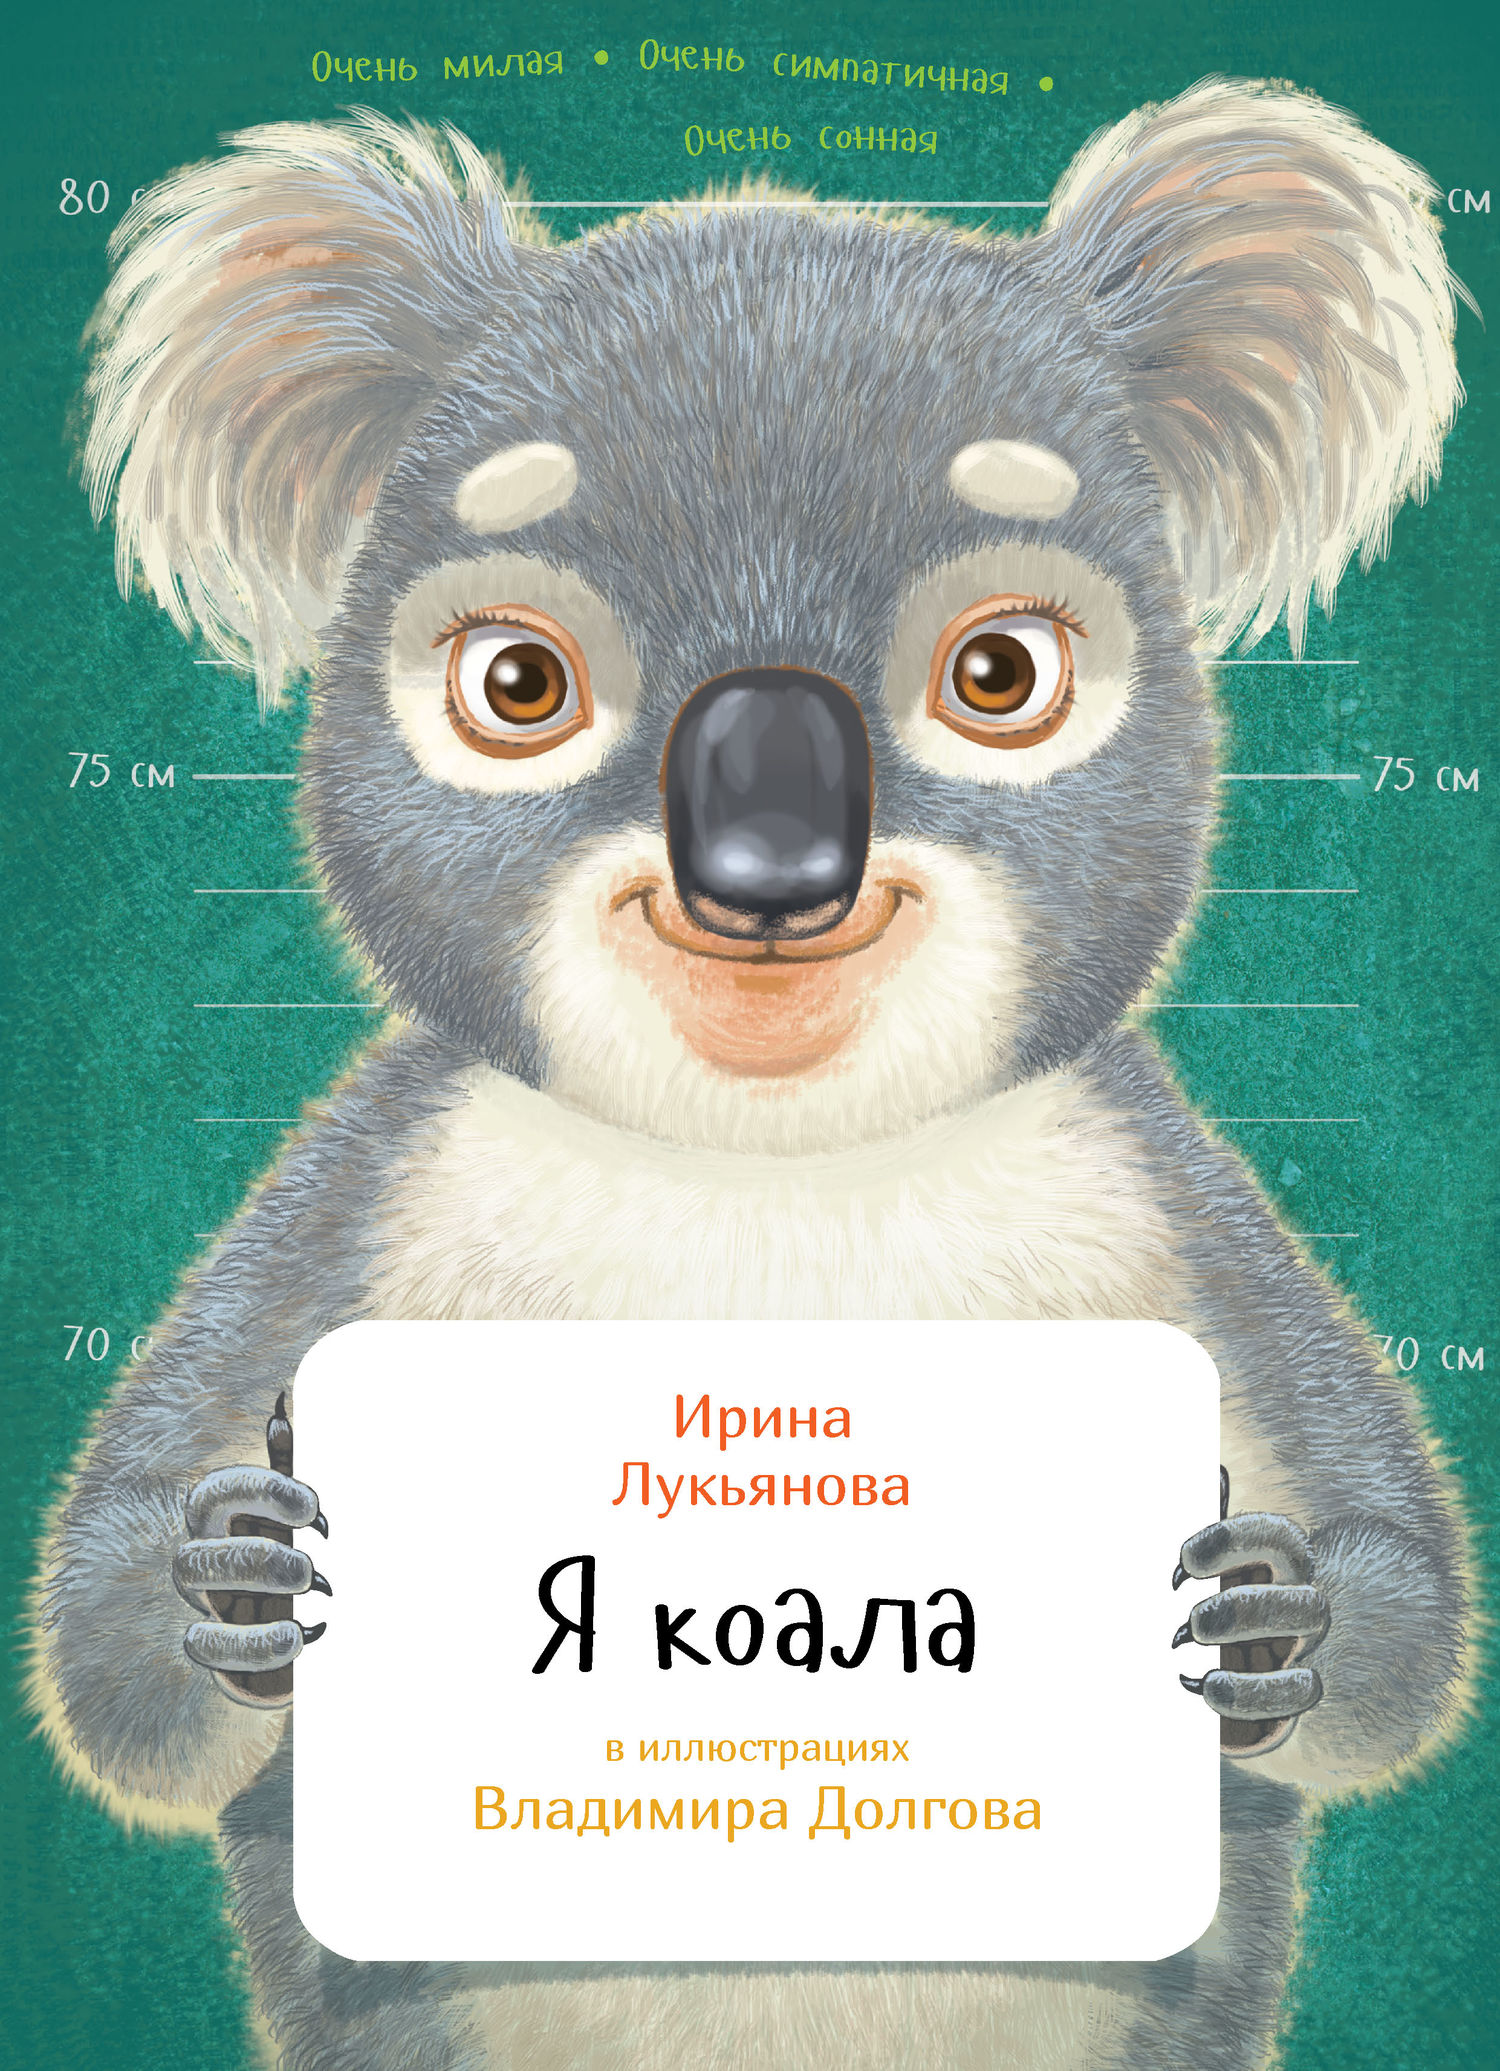 Ирина Лукьянова. Я коала